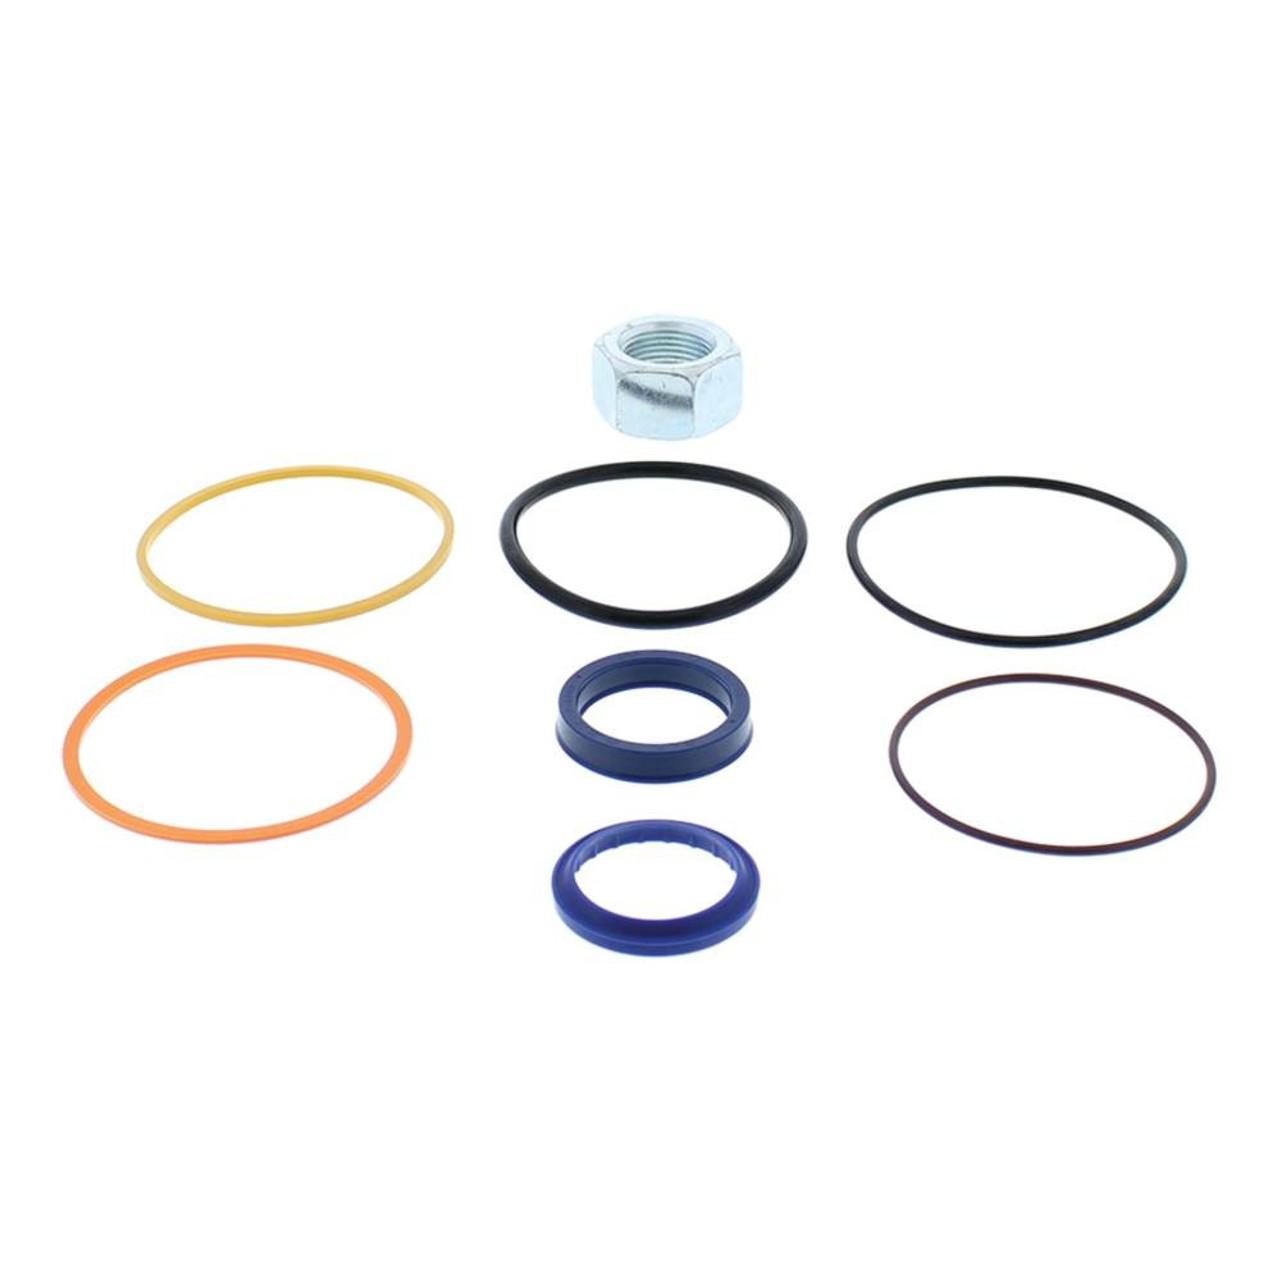 Hydraulic Cylinder Seal Kit For Bobcat 753 Skid Steer 763 Skid Steer 7135555